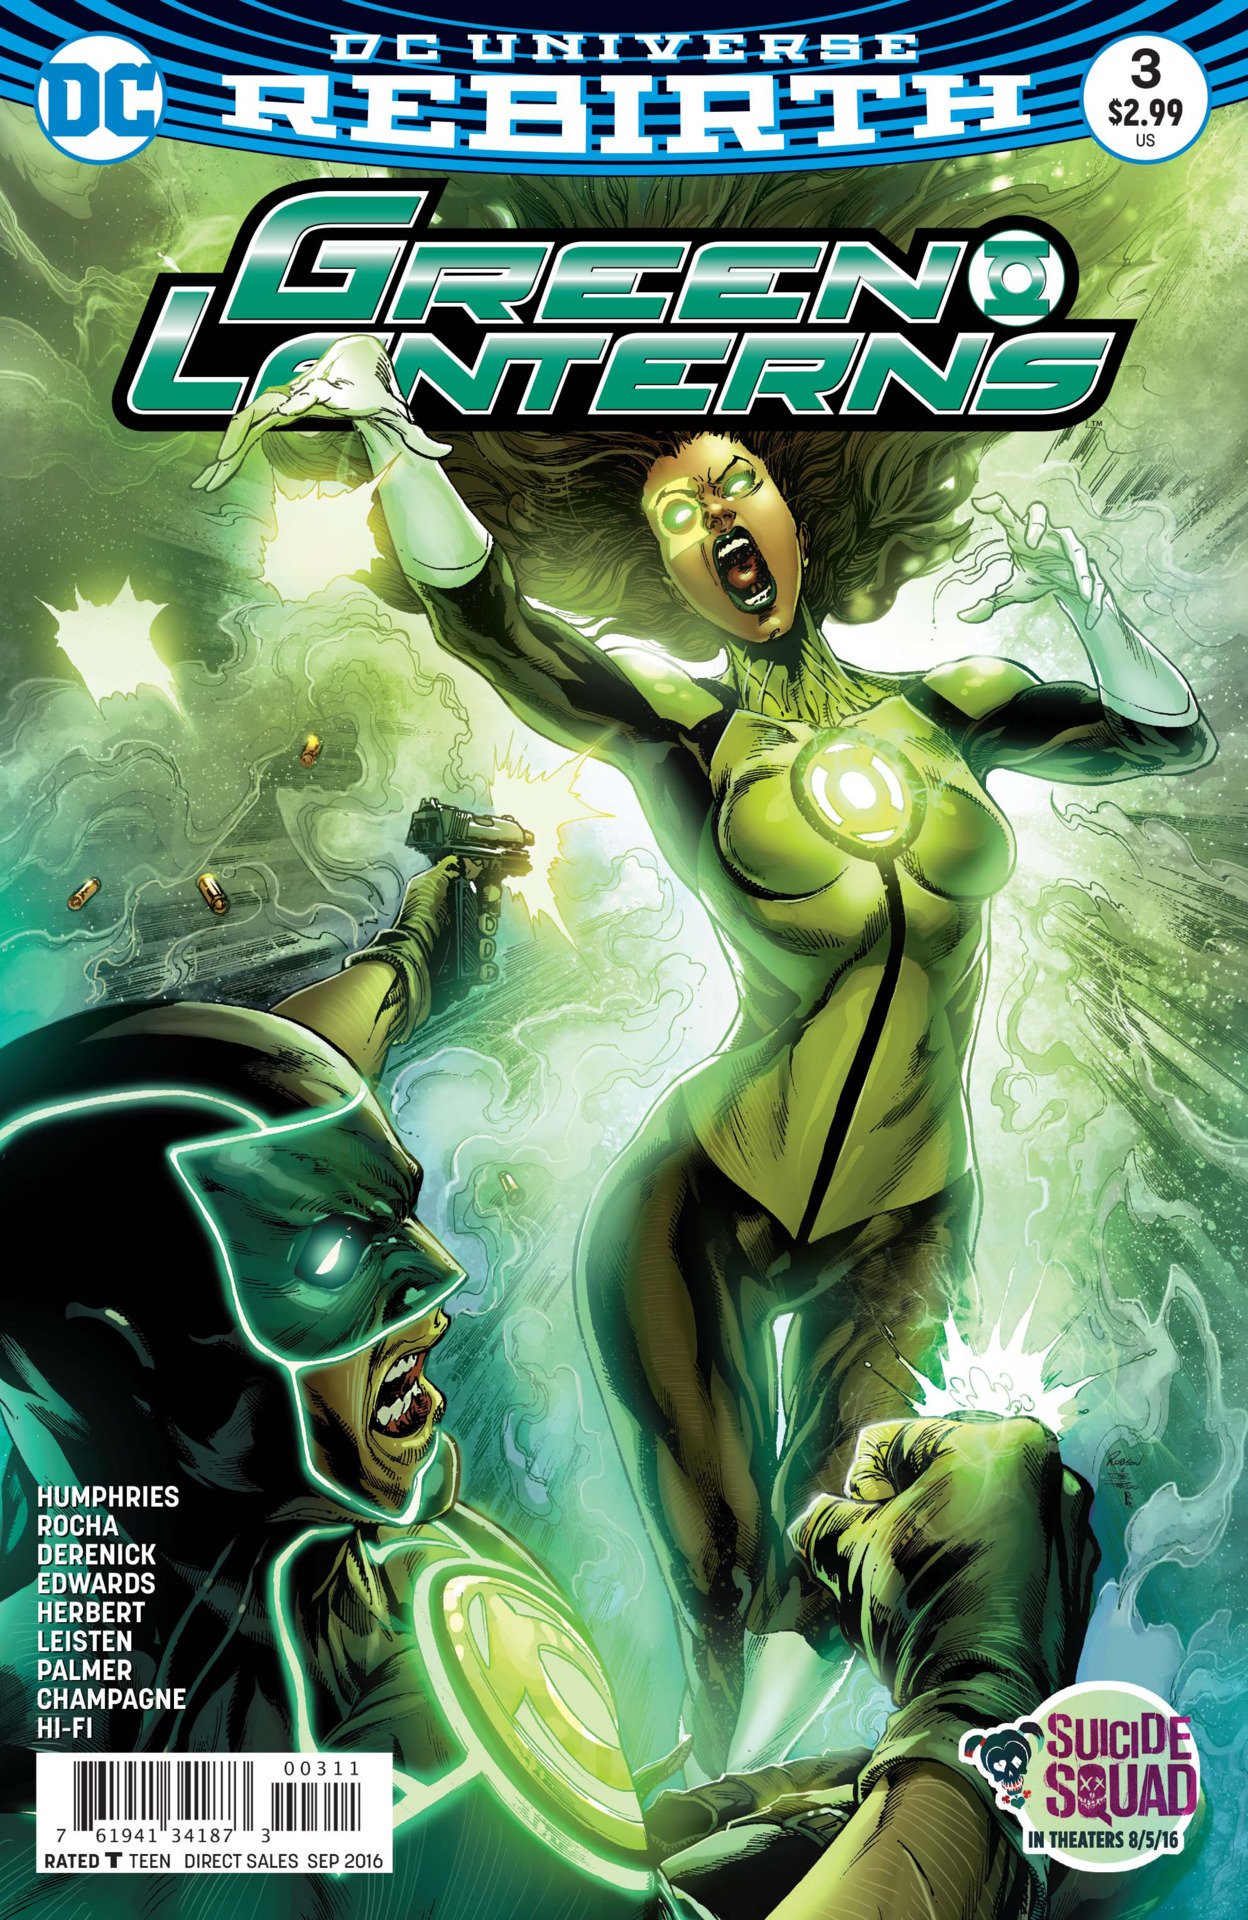 Green Lanterns Vol 1 3